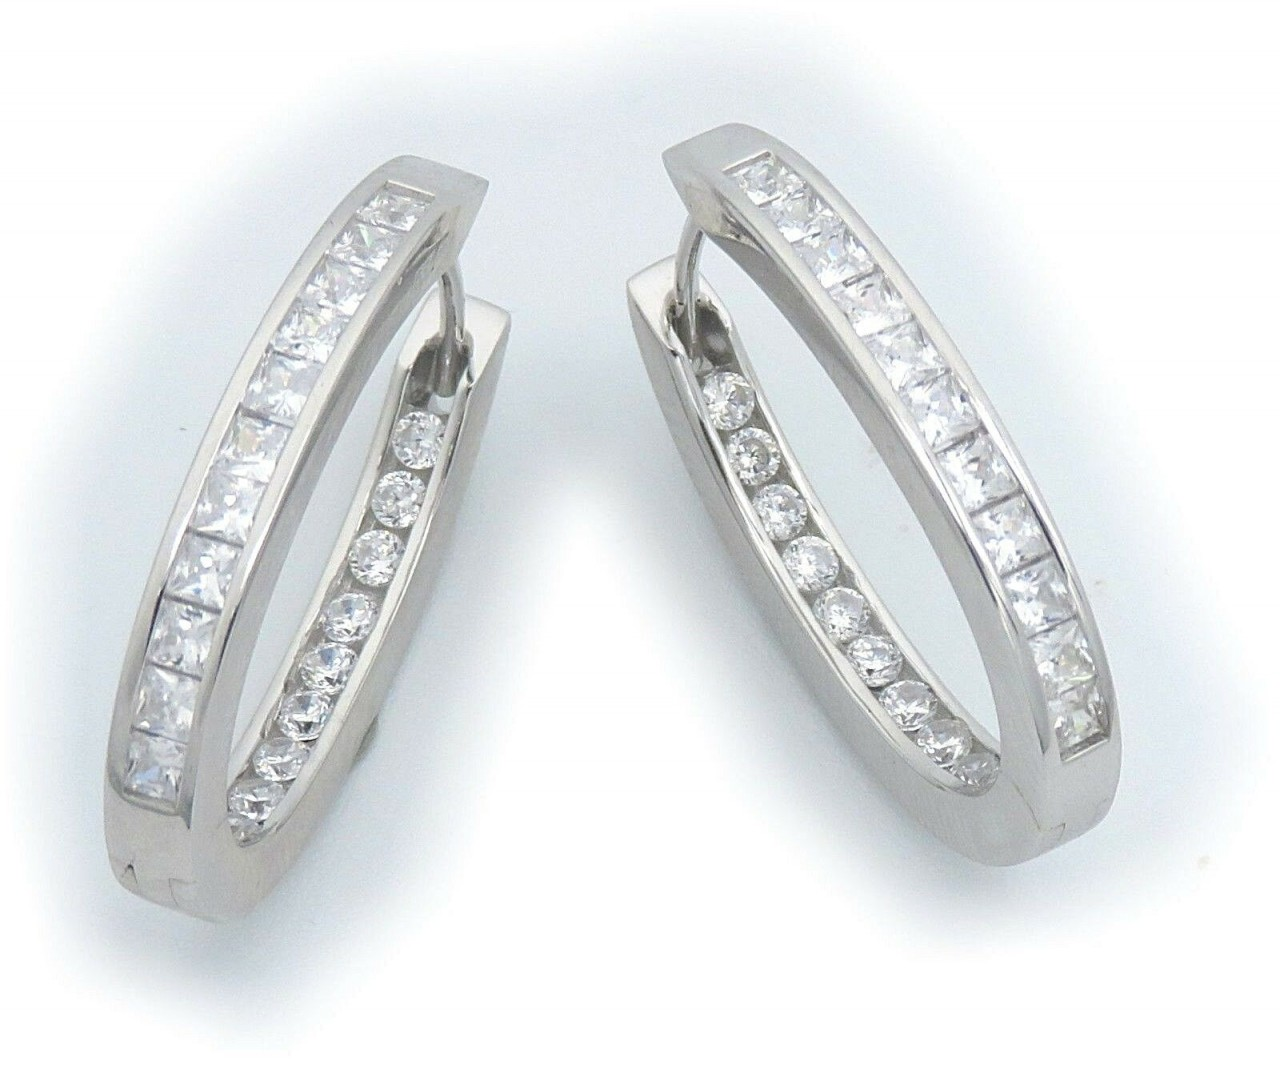 Damen Ohrringe Klapp Creolen Zirkonia hinten echt Silber 925 Sterlingsilber NEU